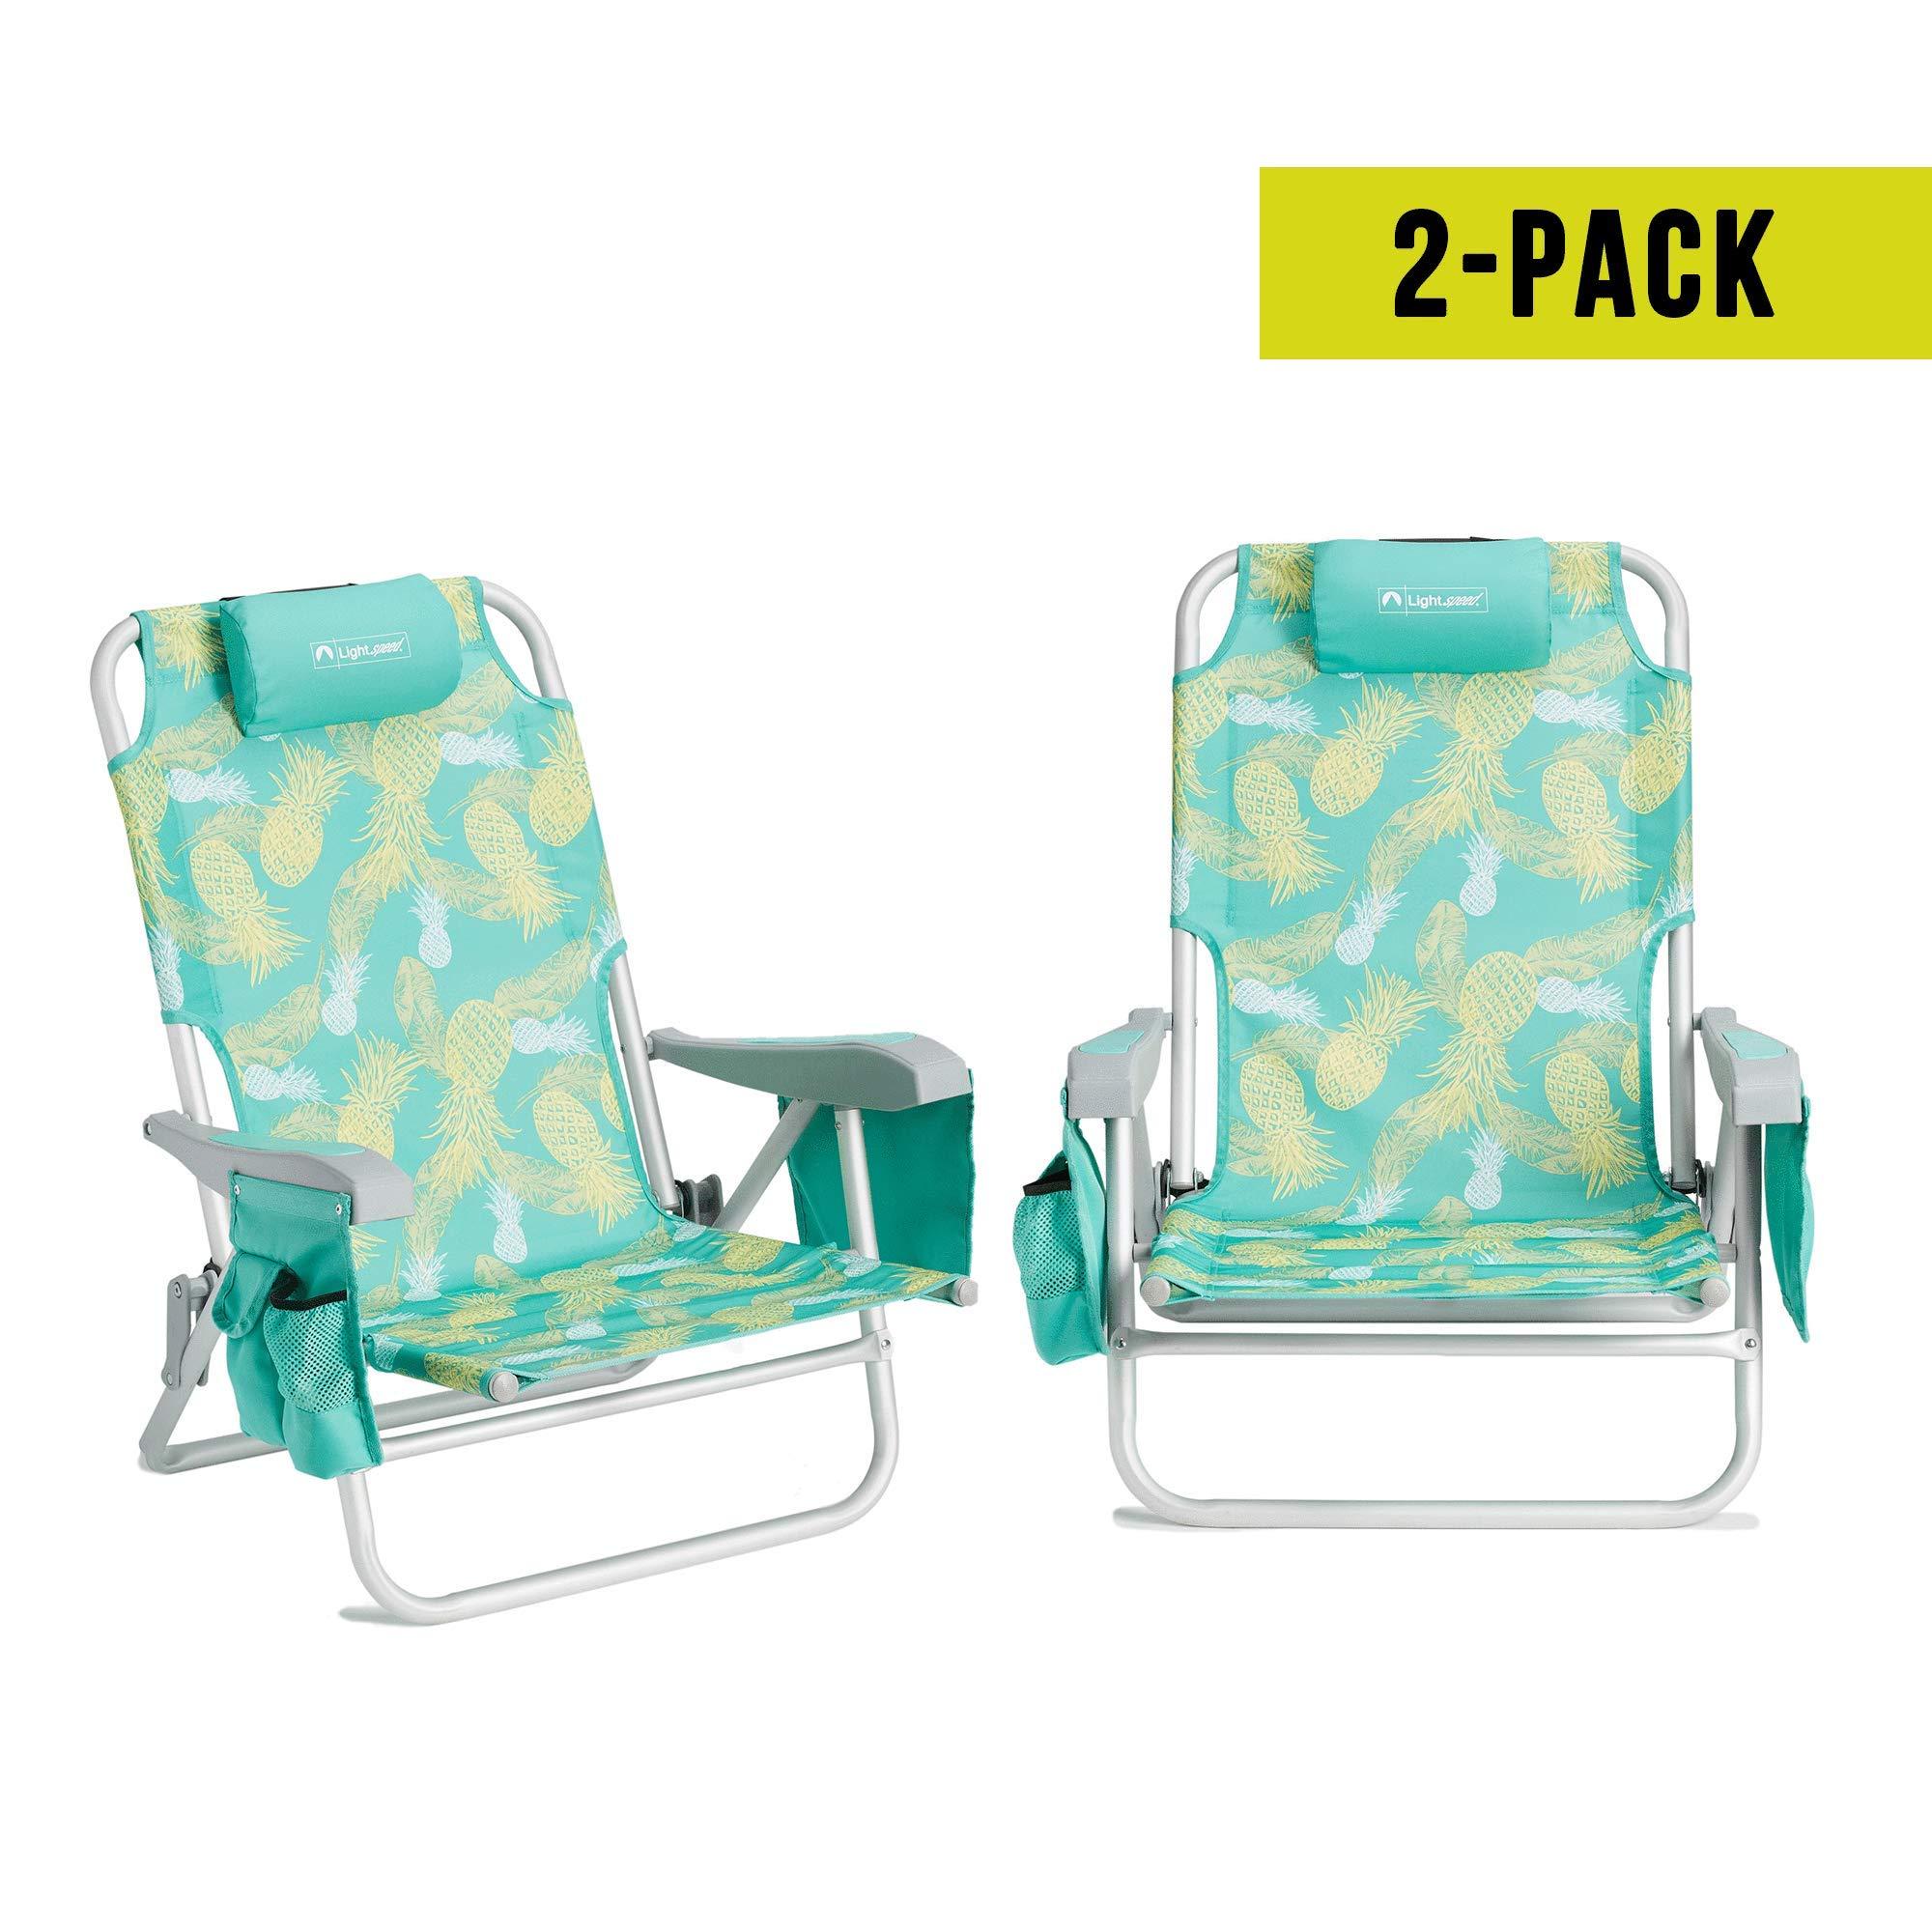 Lightspeed Outdoors 2-Pack Adjustable Backpack Beach Chairs (Pineapple)